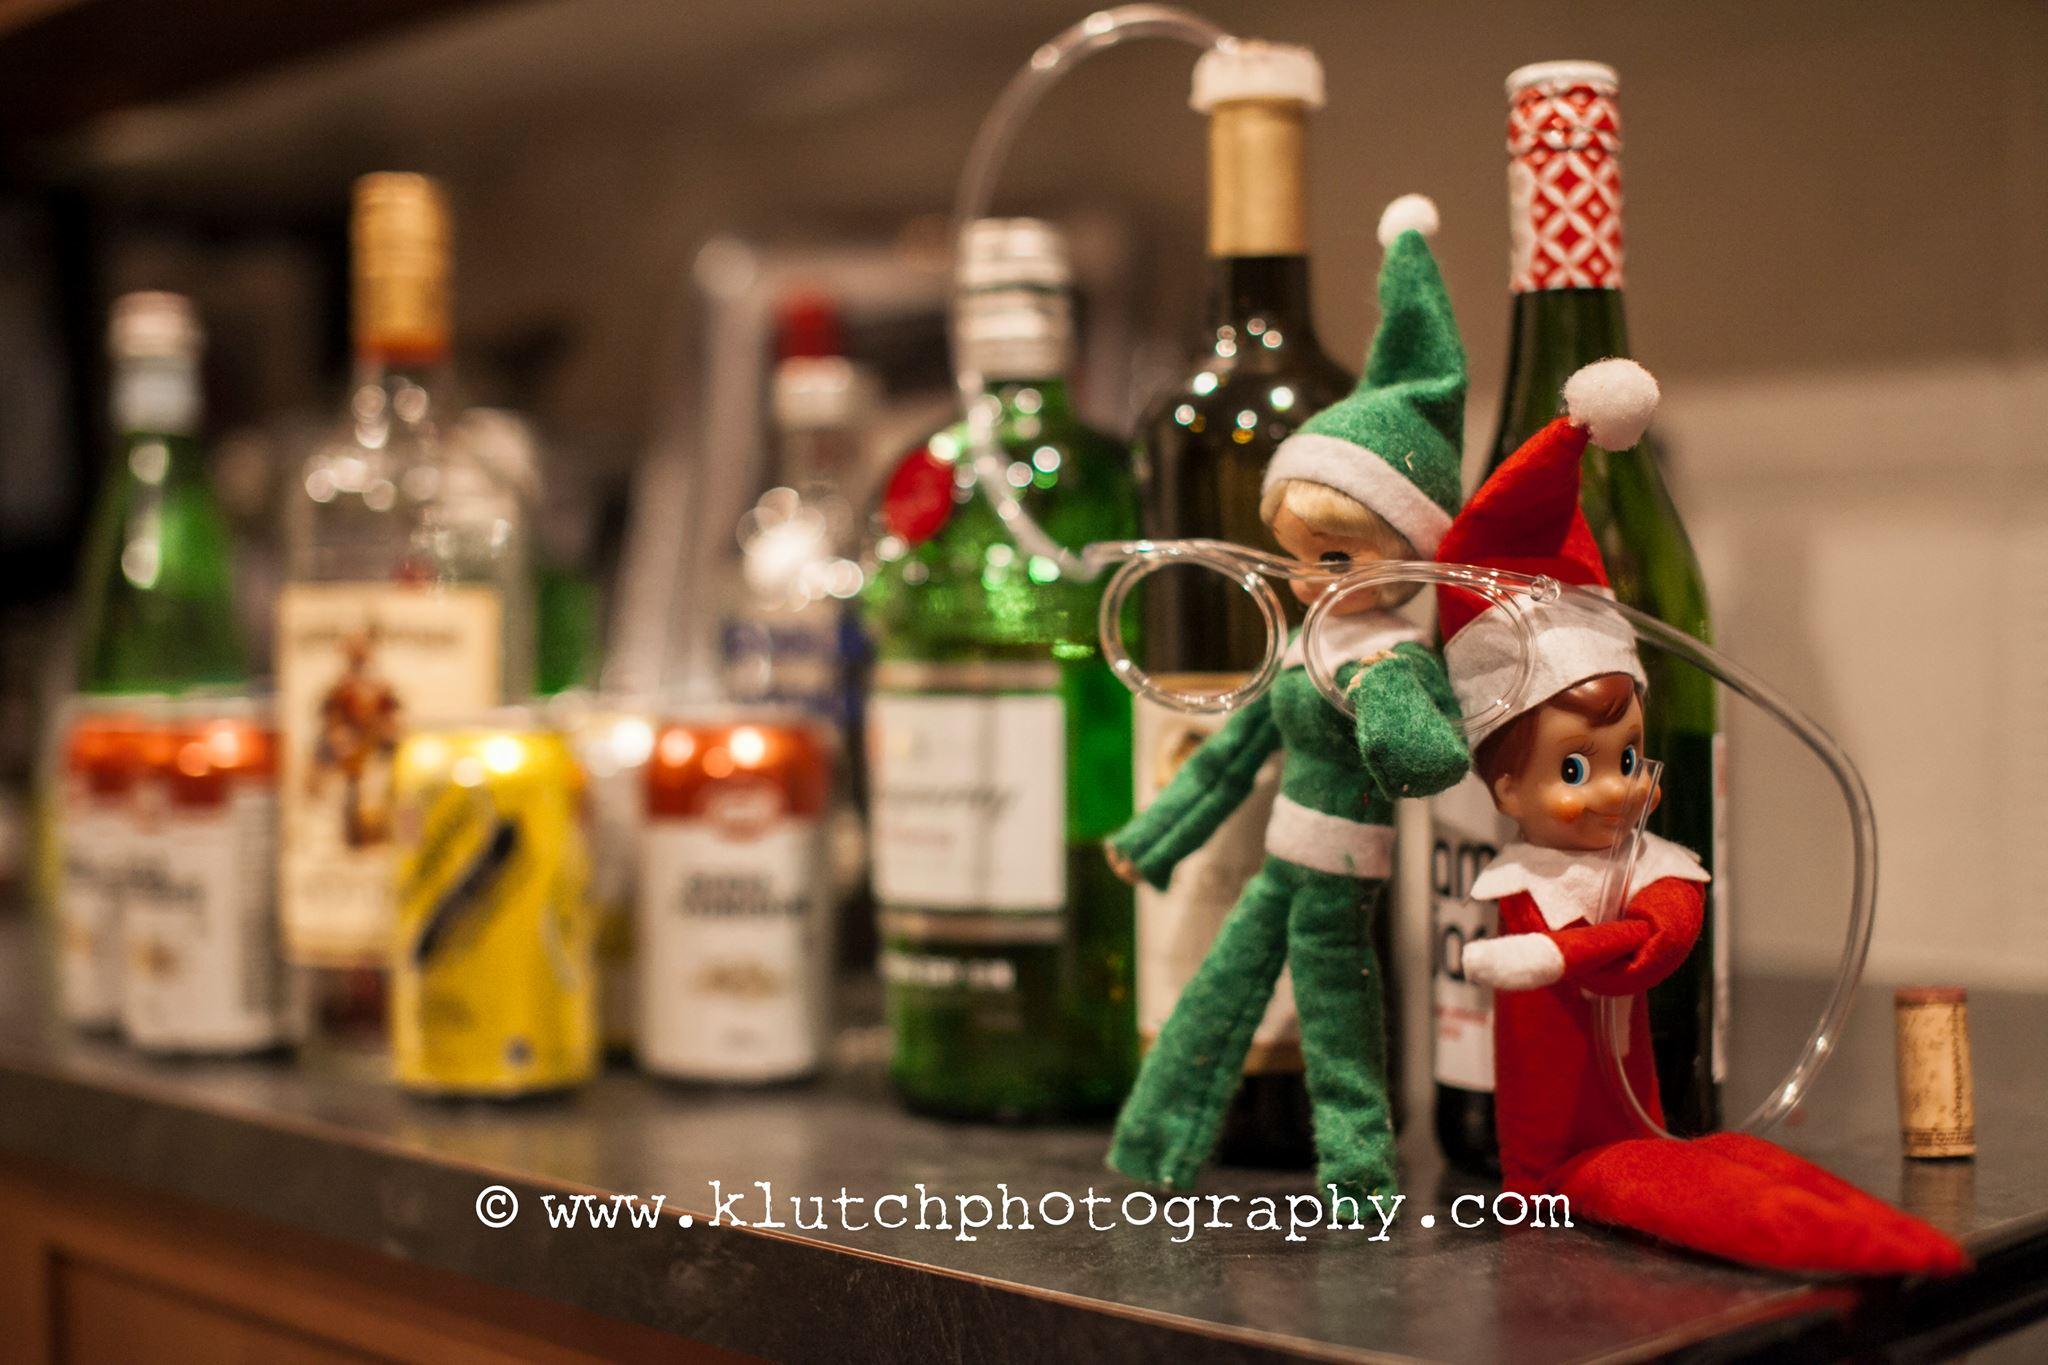 Klutch Photography, family photographer, elf on the shelf, vancouver family photographer, whiterock family photographer, lifeunscripted photographer, lifestlye photographer z.jpg